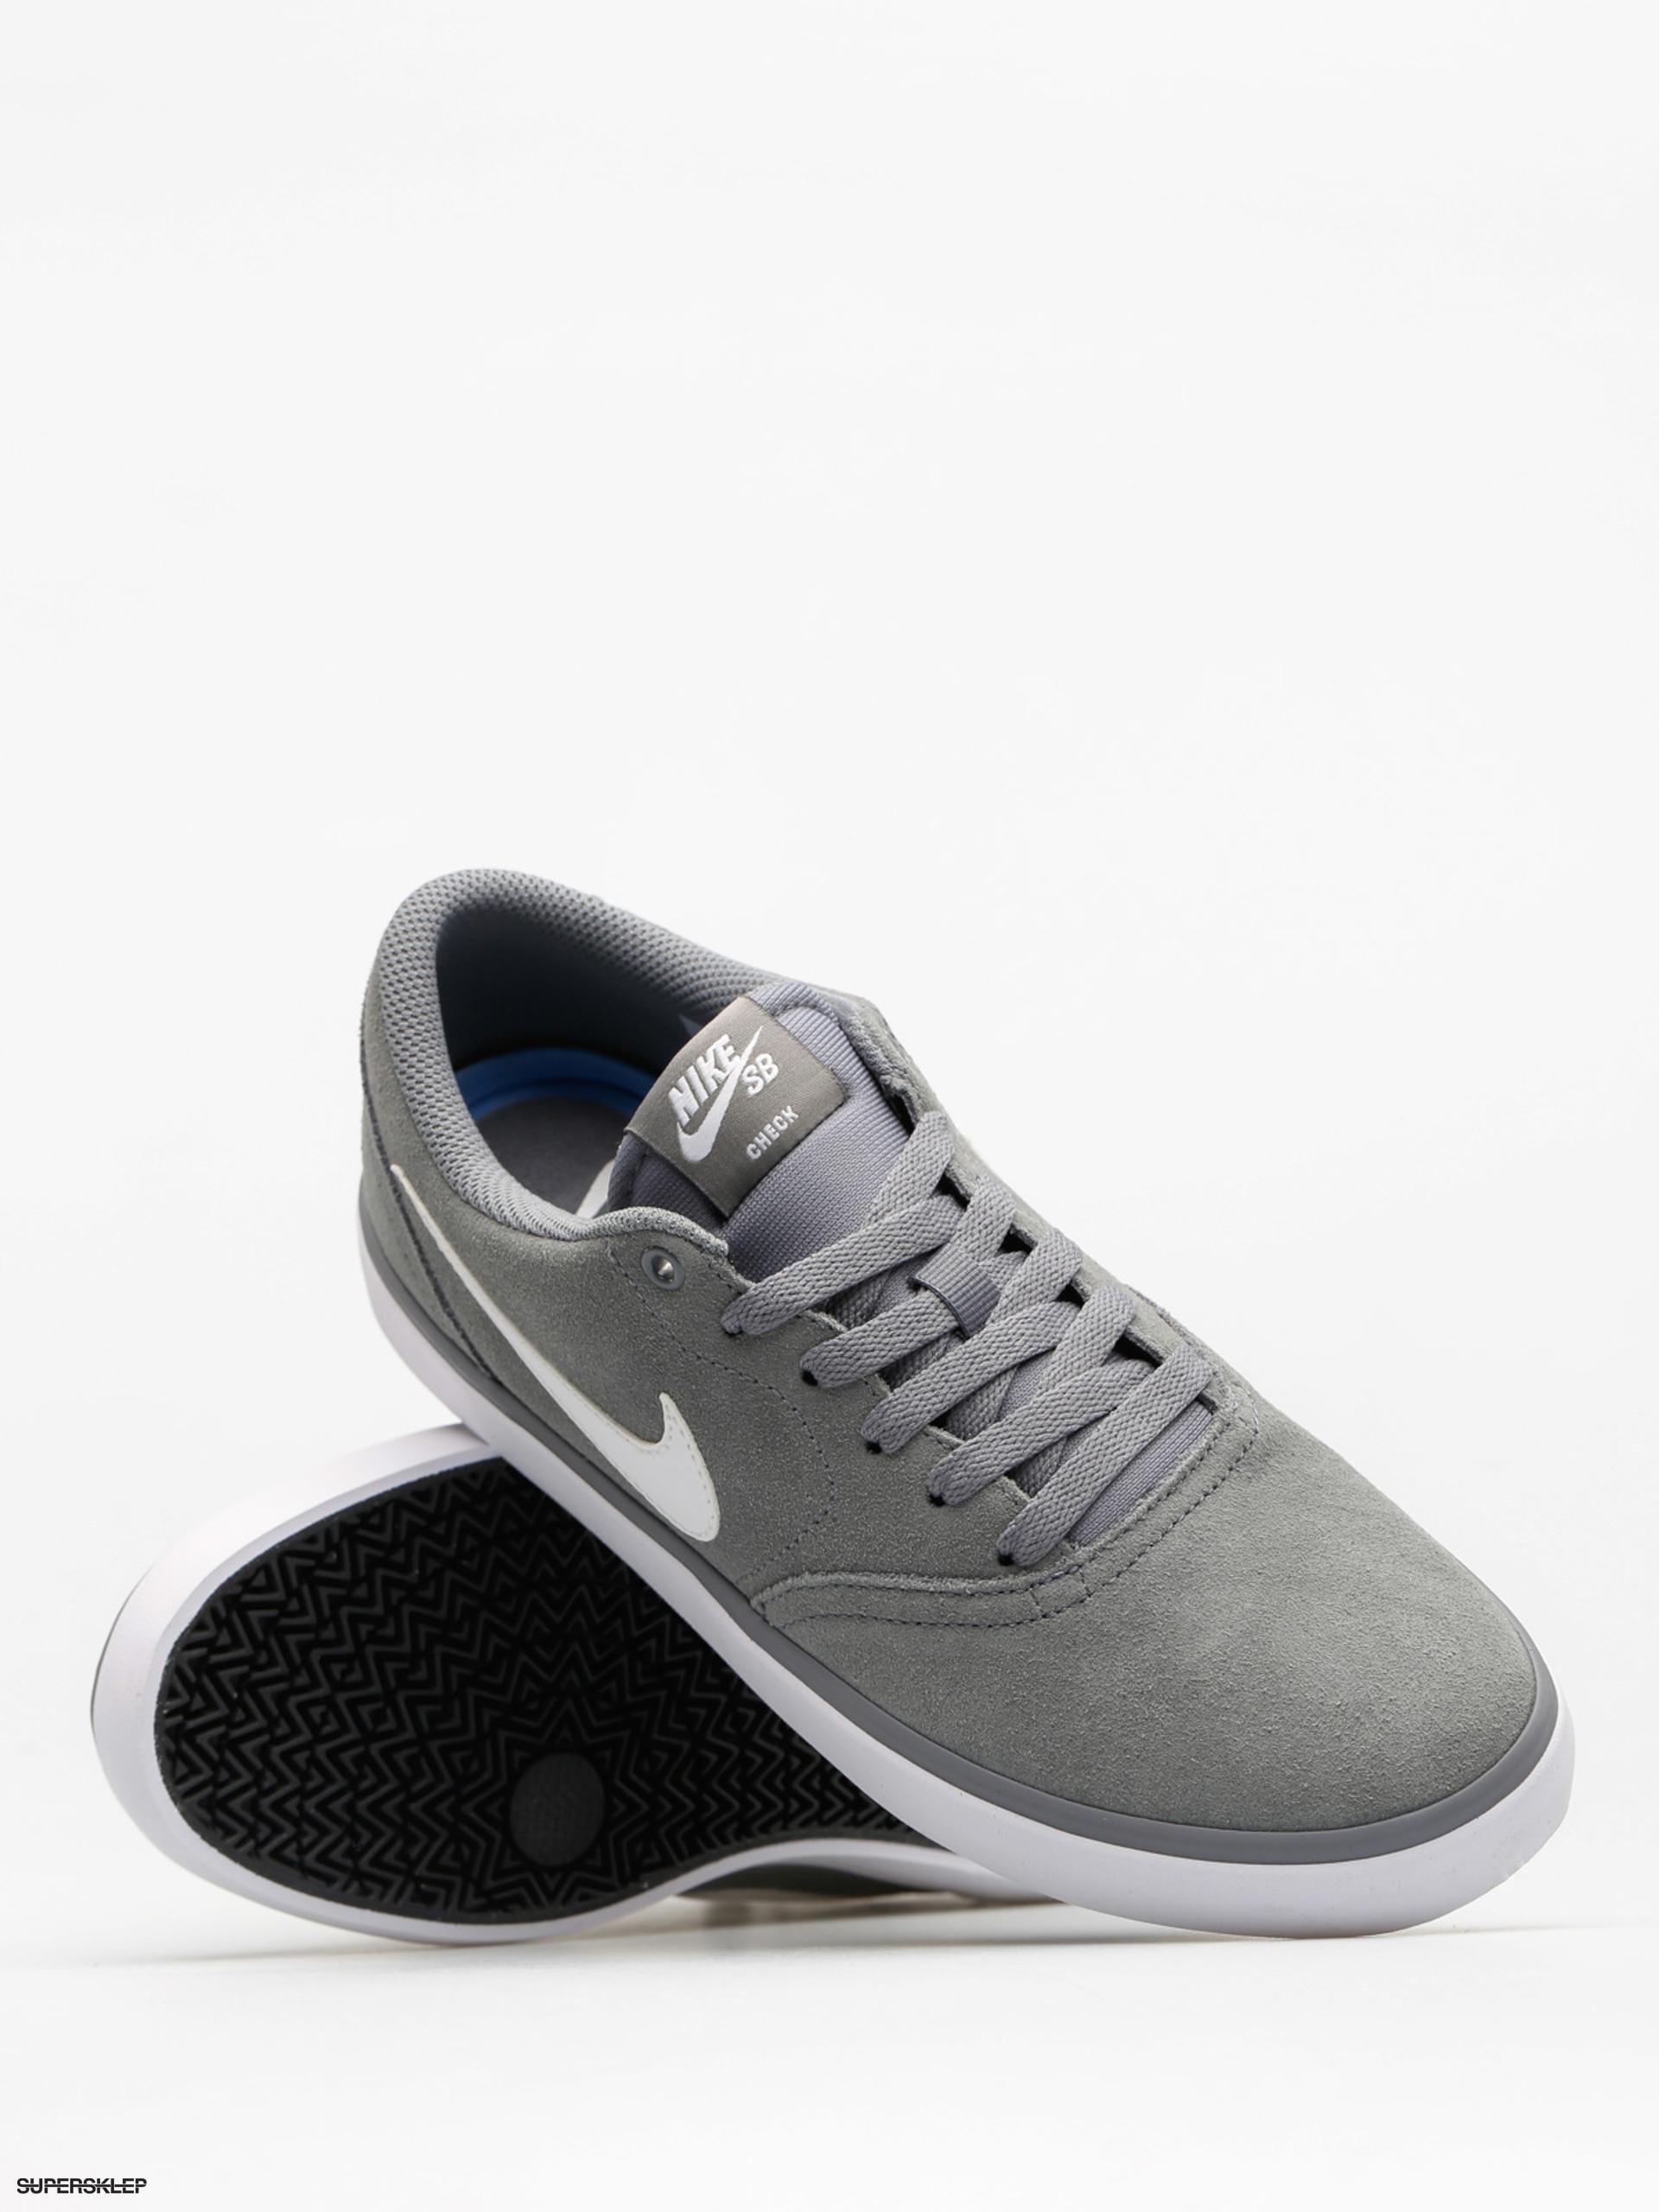 reputable site 934e9 83f36 Boty Nike SB Check Solar (cool grey white)